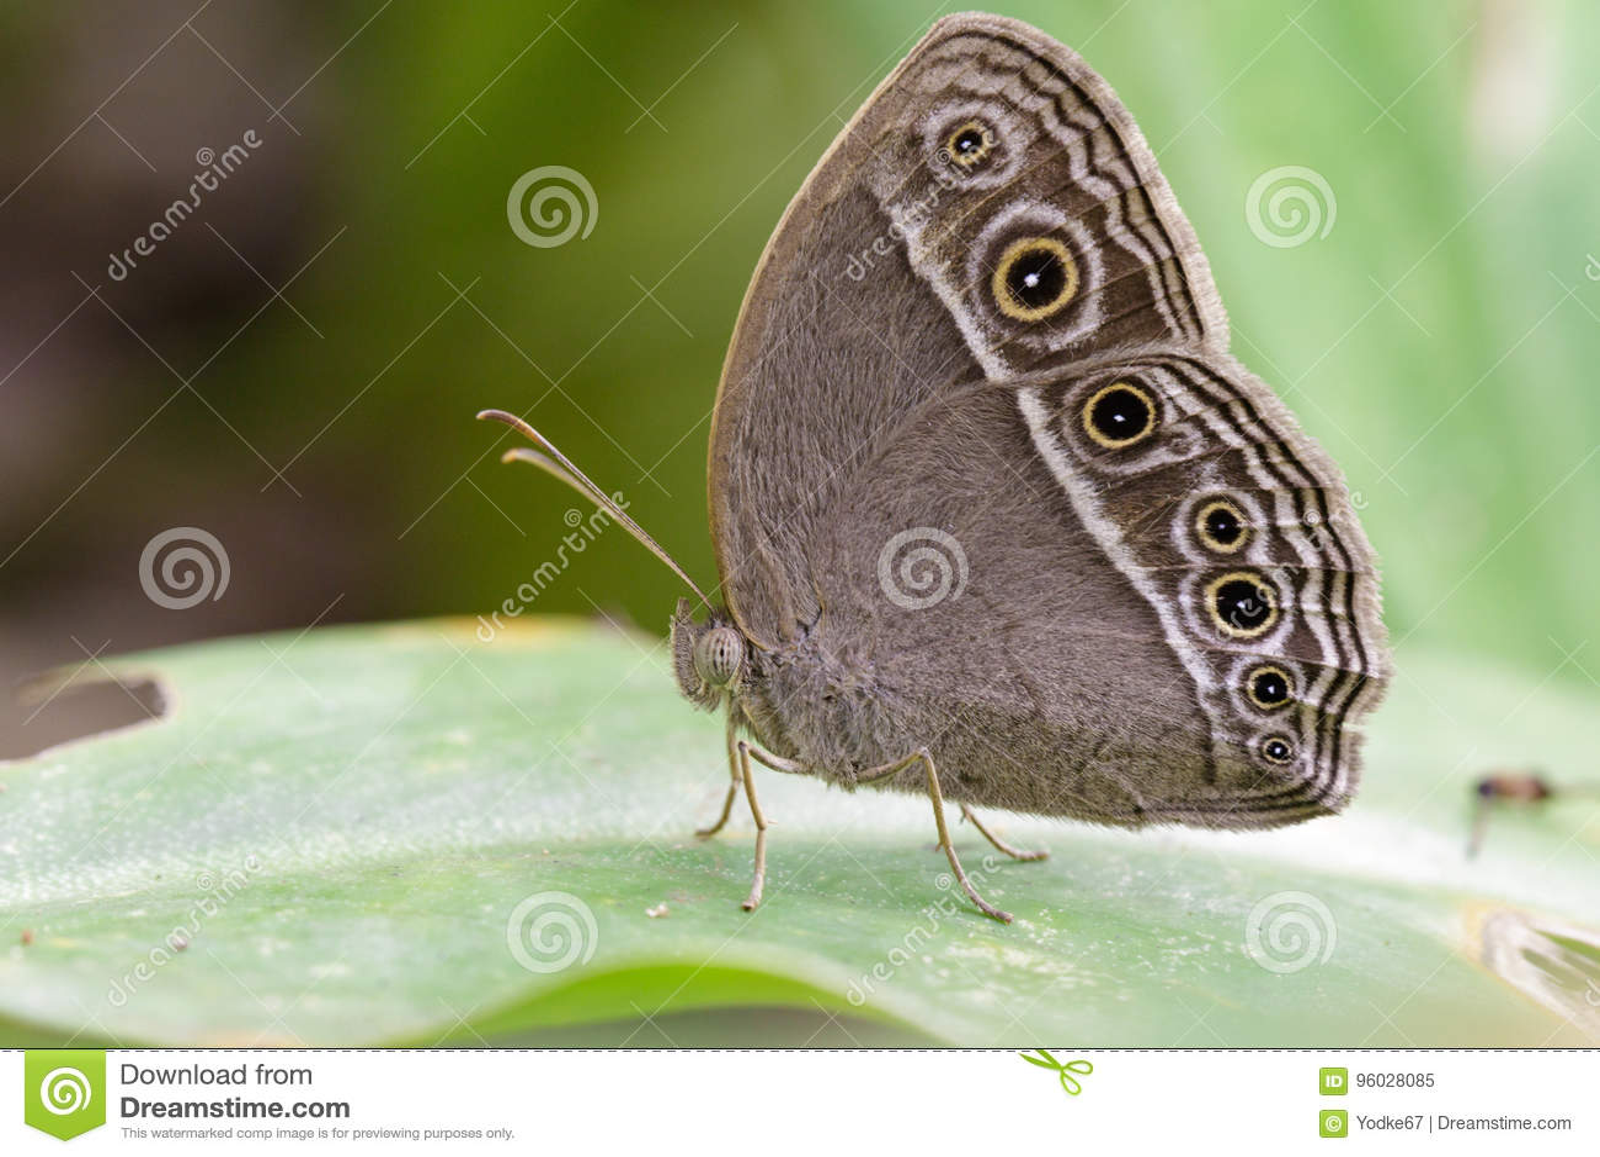 Wizerunek Pospolity Bushbrown motyl